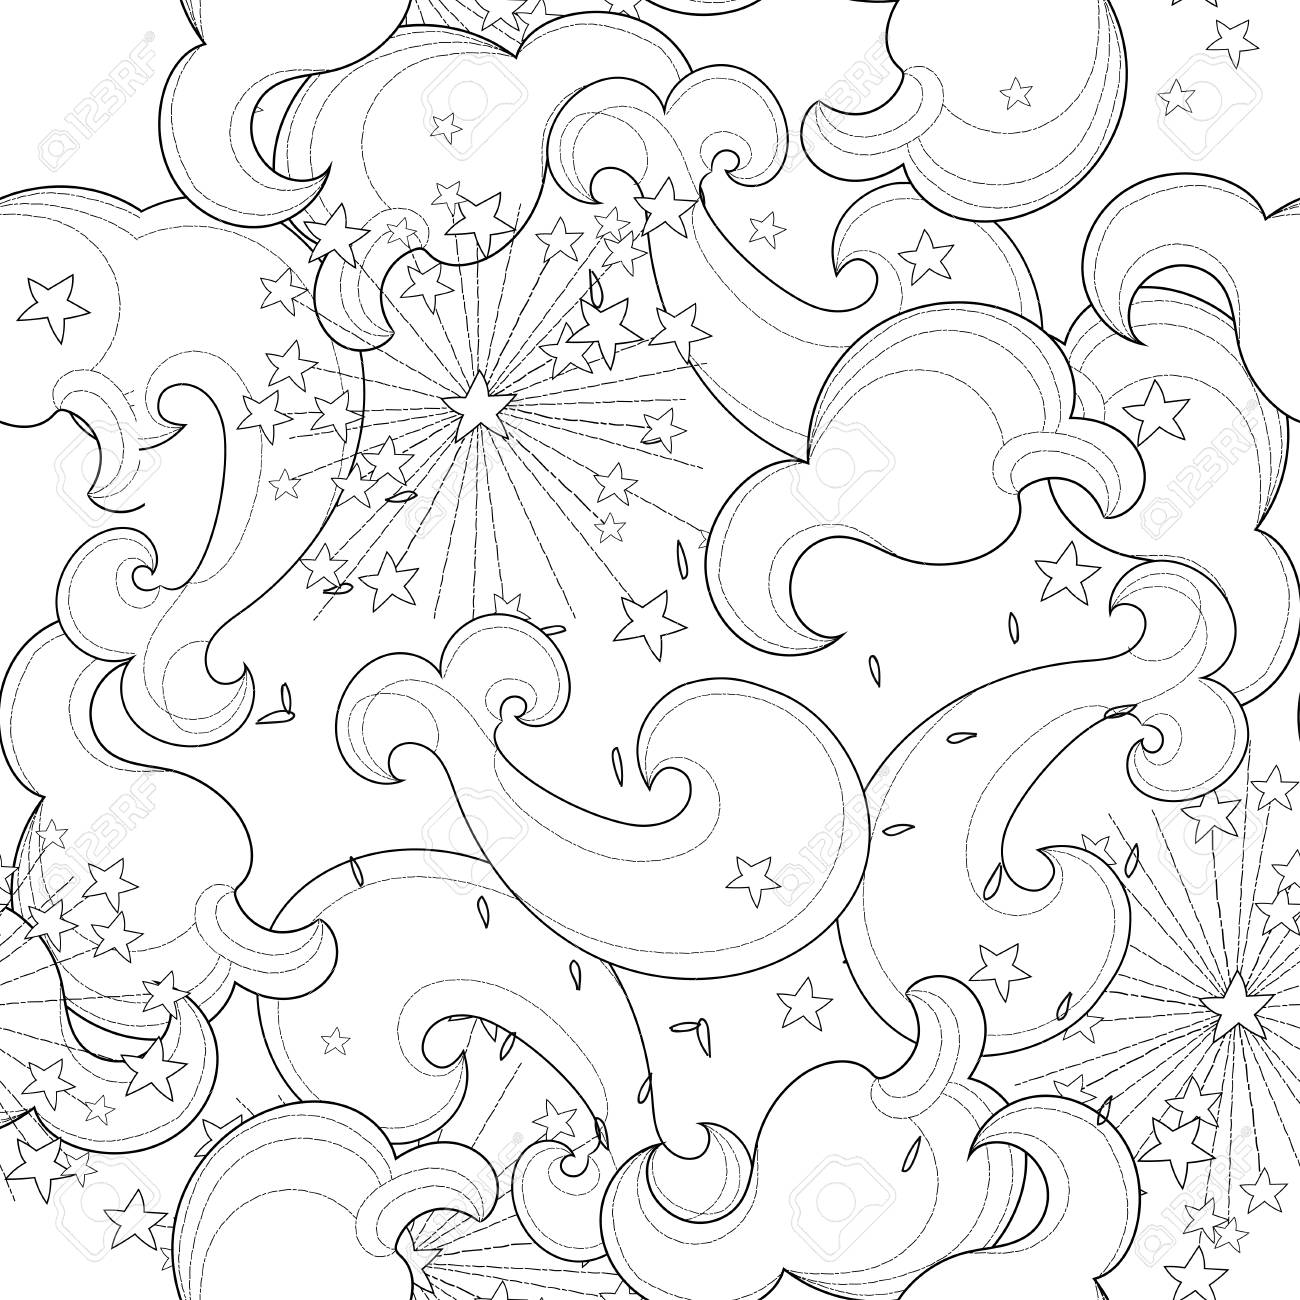 Hand drawn doodle outline cloud seamless pattern Vector zen art